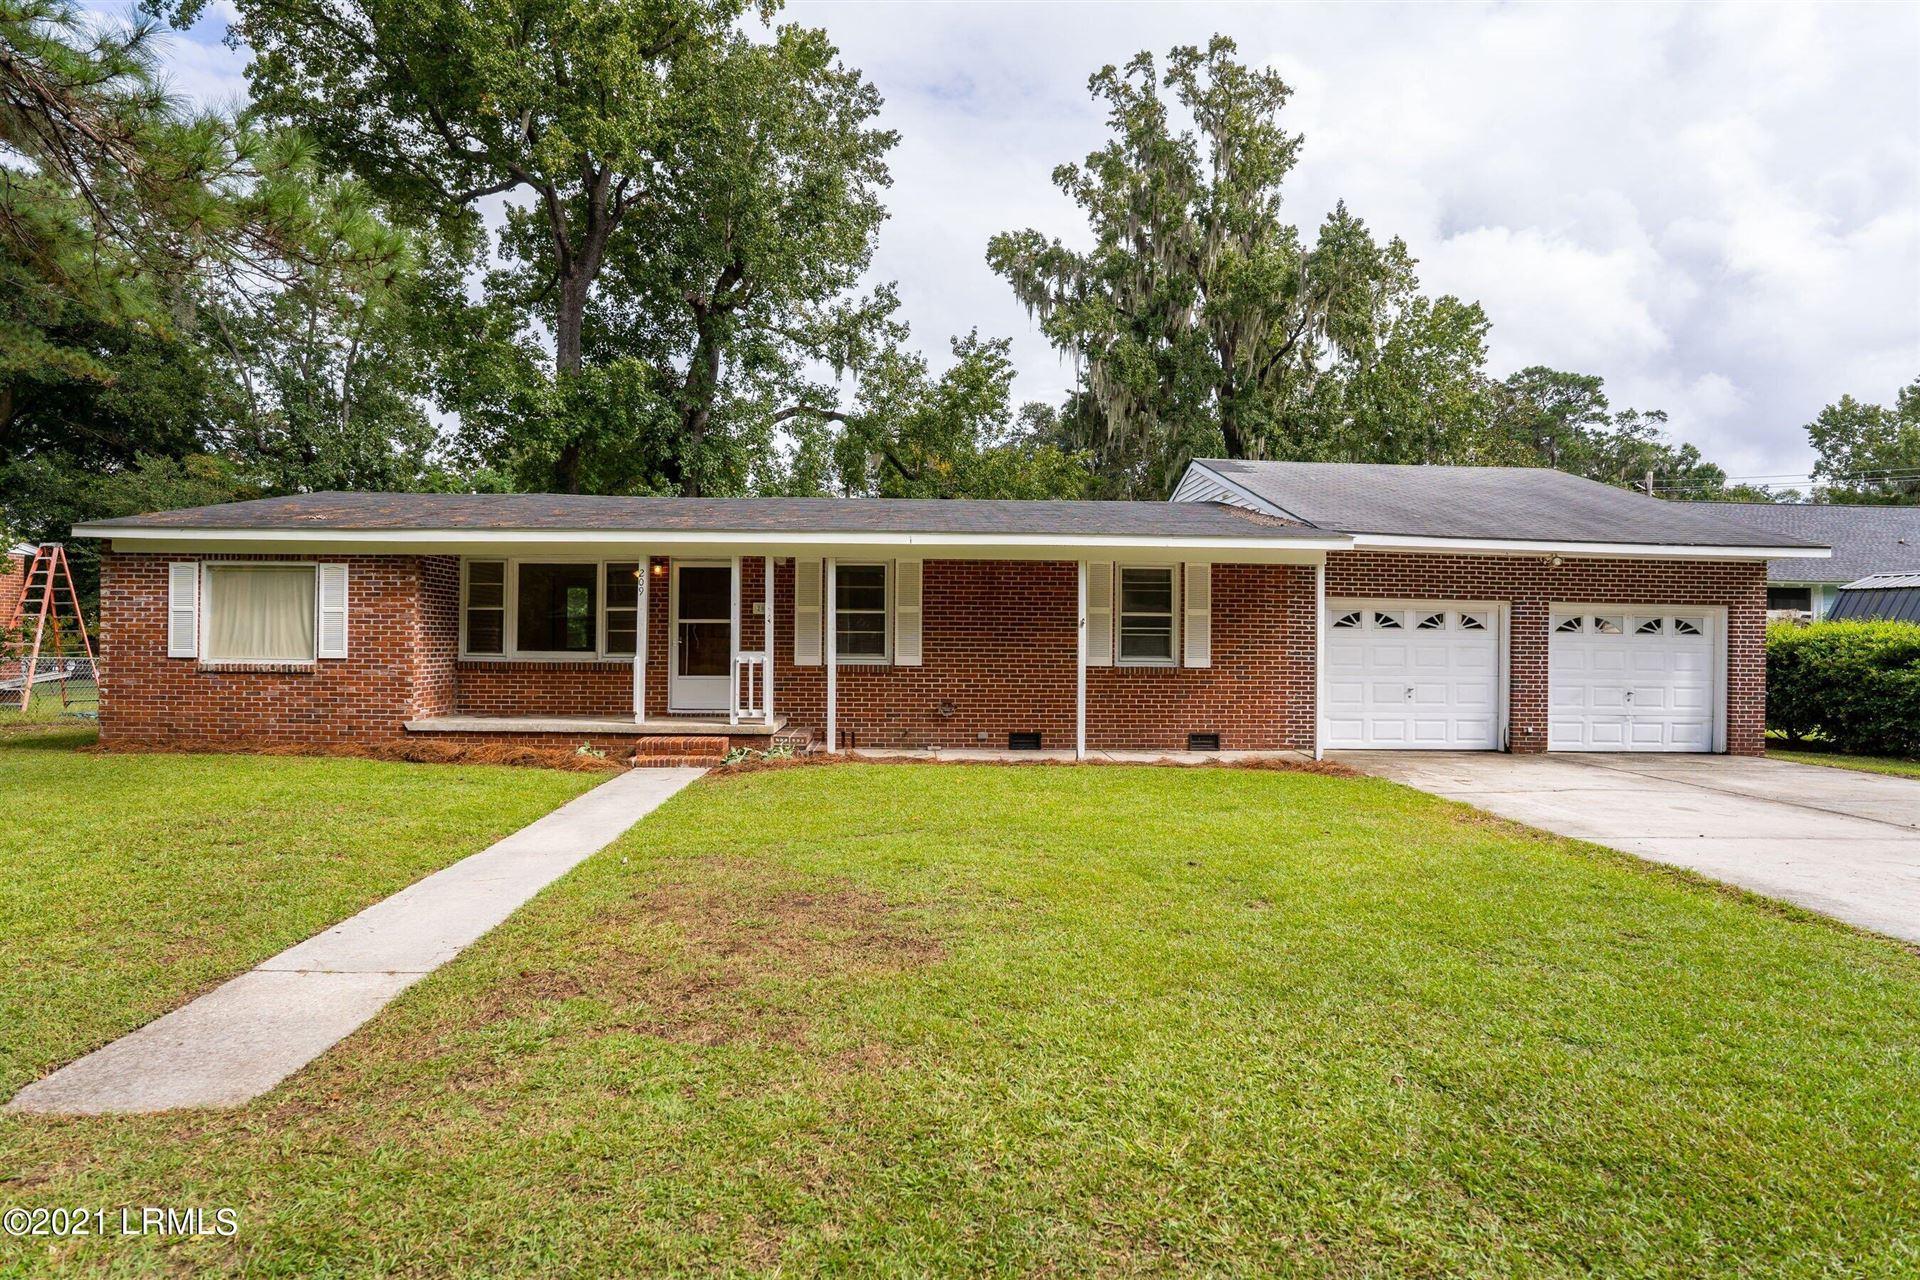 209 Burroughs Avenue, Beaufort, SC 29902 - MLS#: 173238